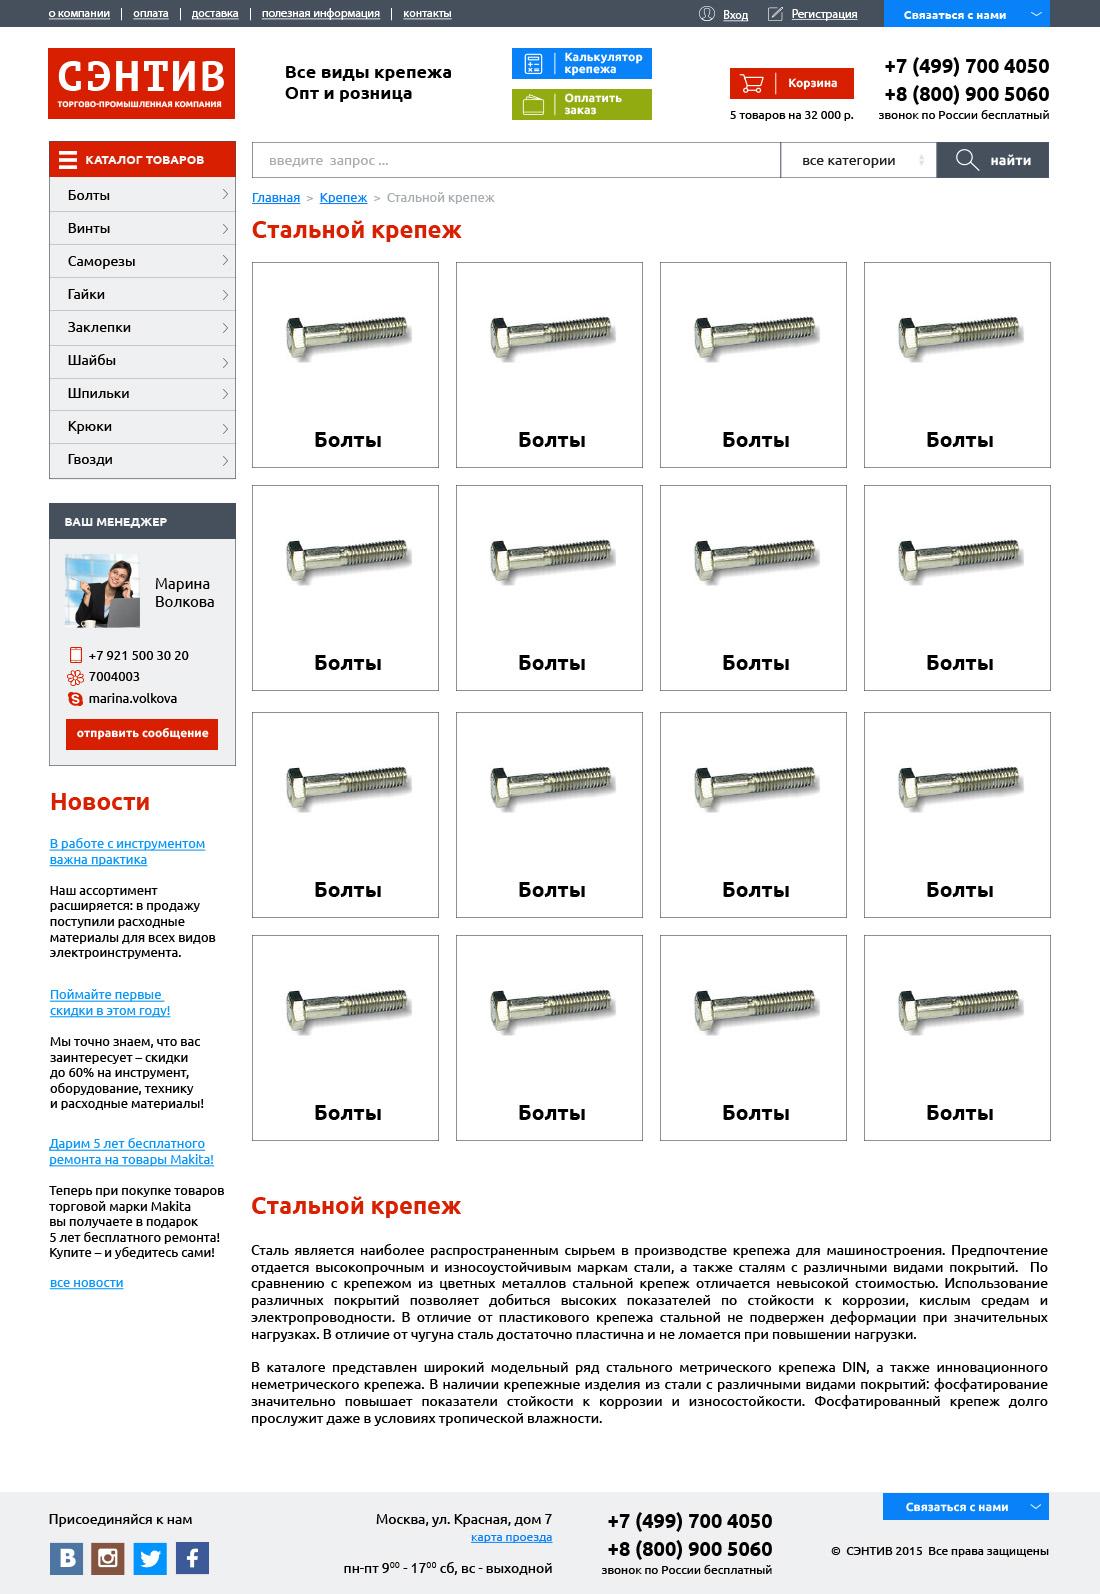 Интернет магазин sentiv.ru